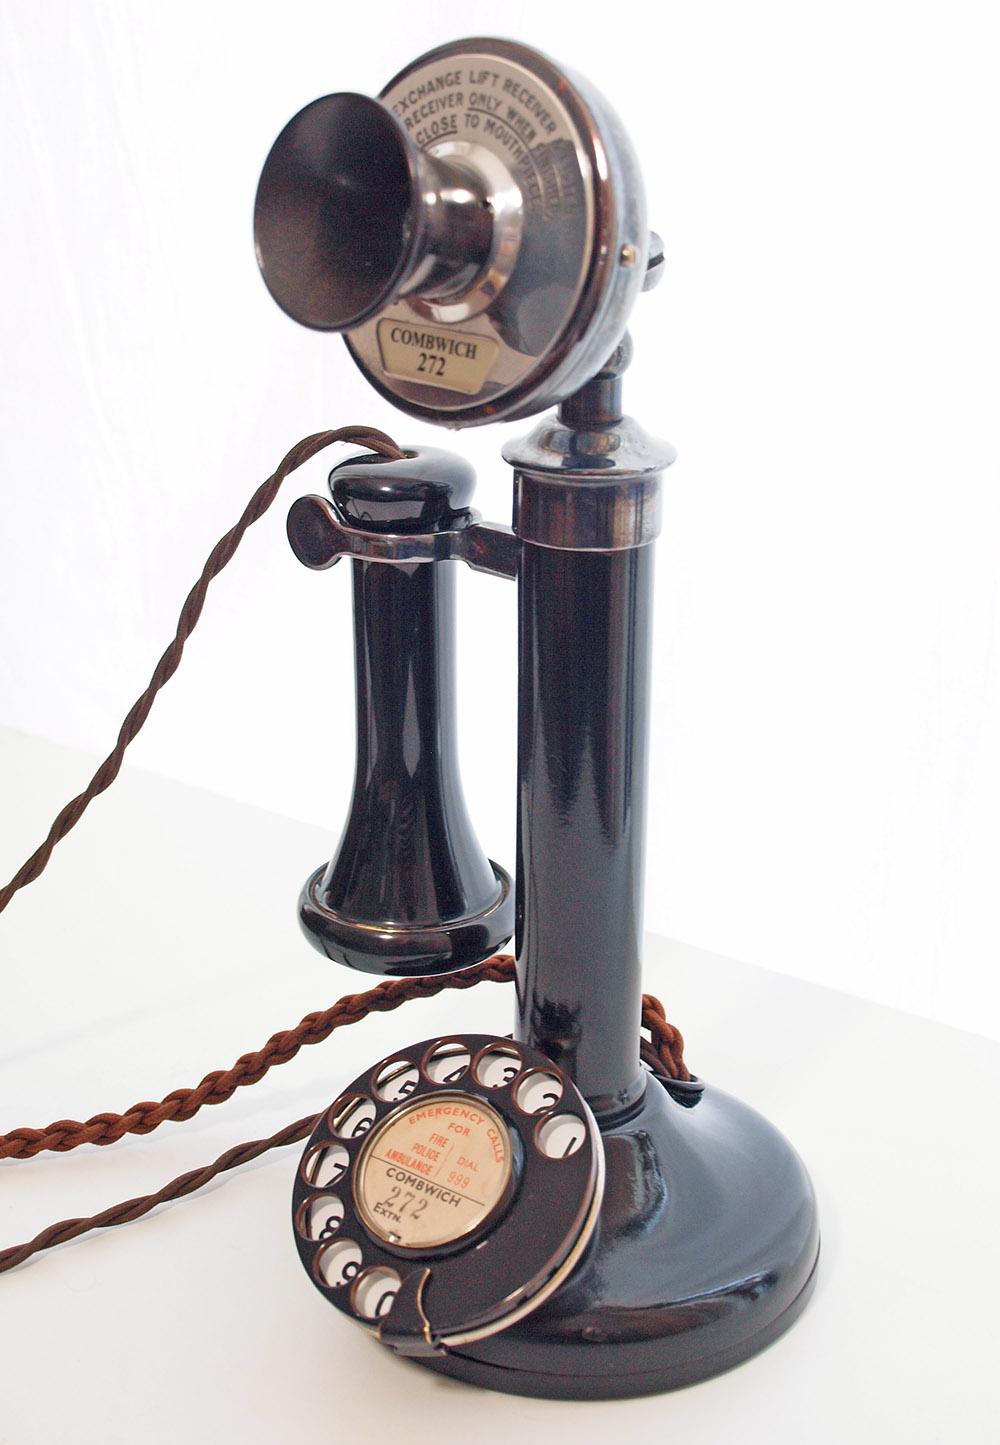 Gpo 150 Candlestick Telephone